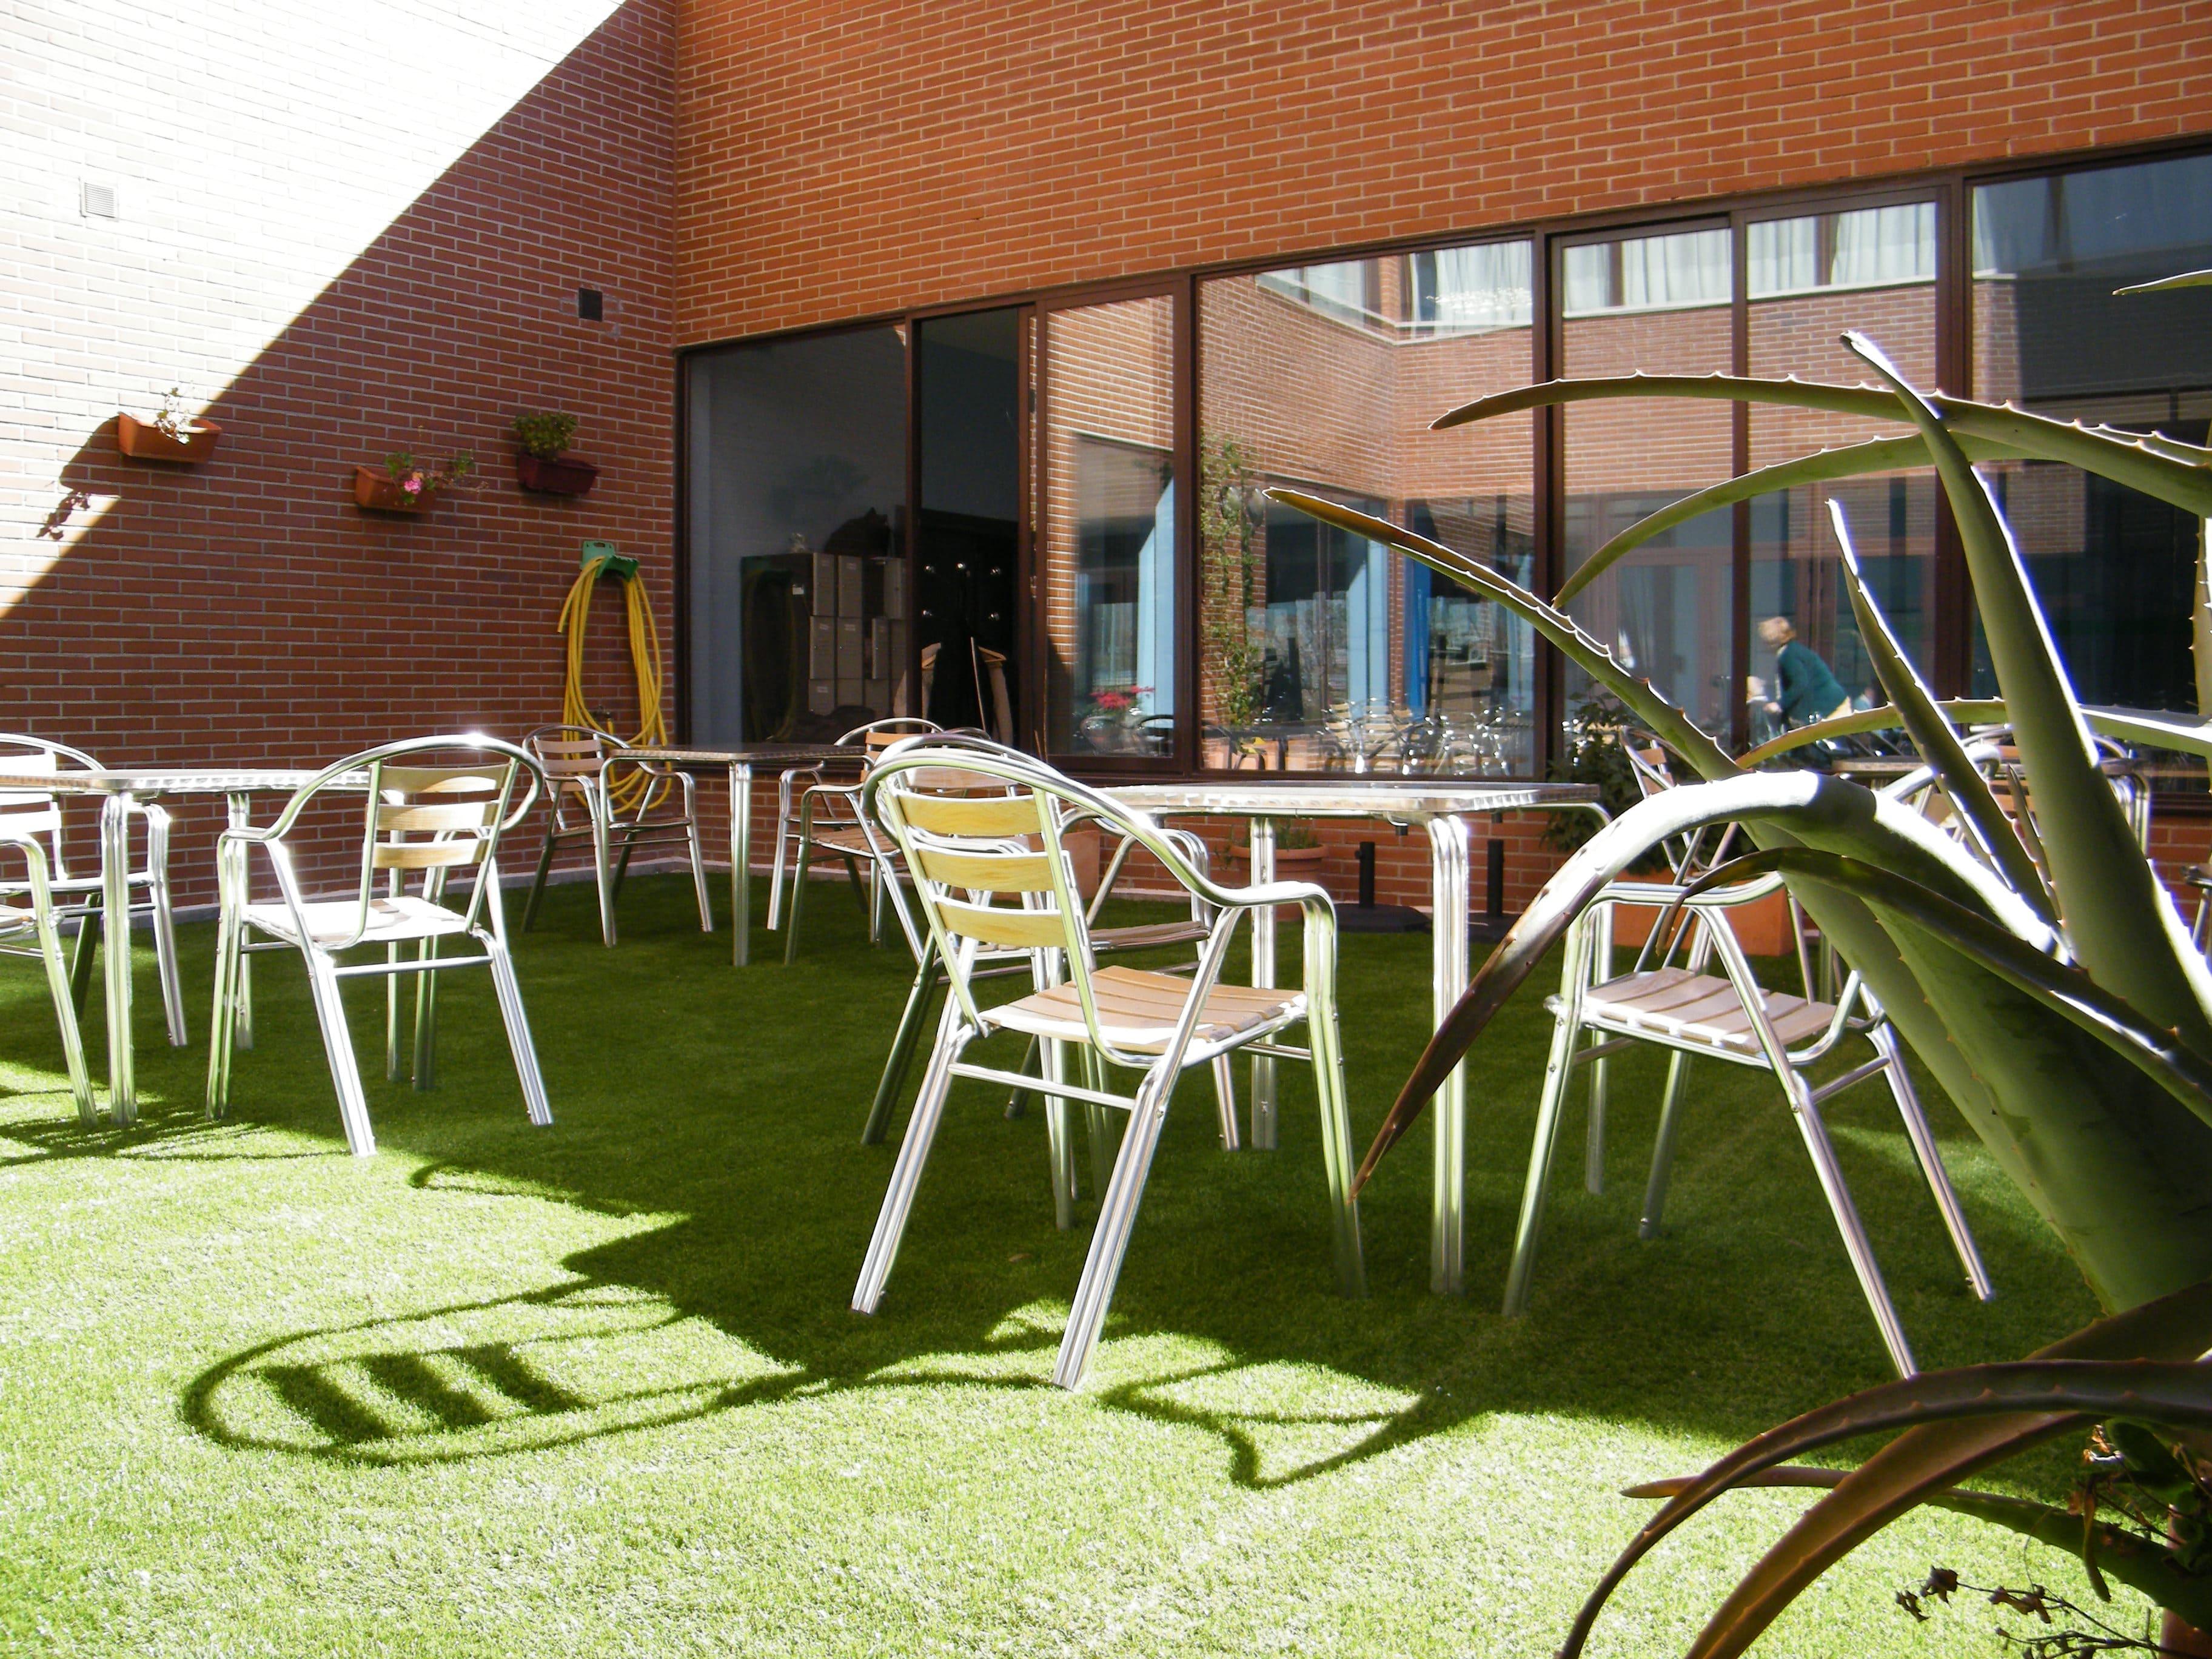 Residencia_Albertia_Valle_De_La_Oliva_-_terraza